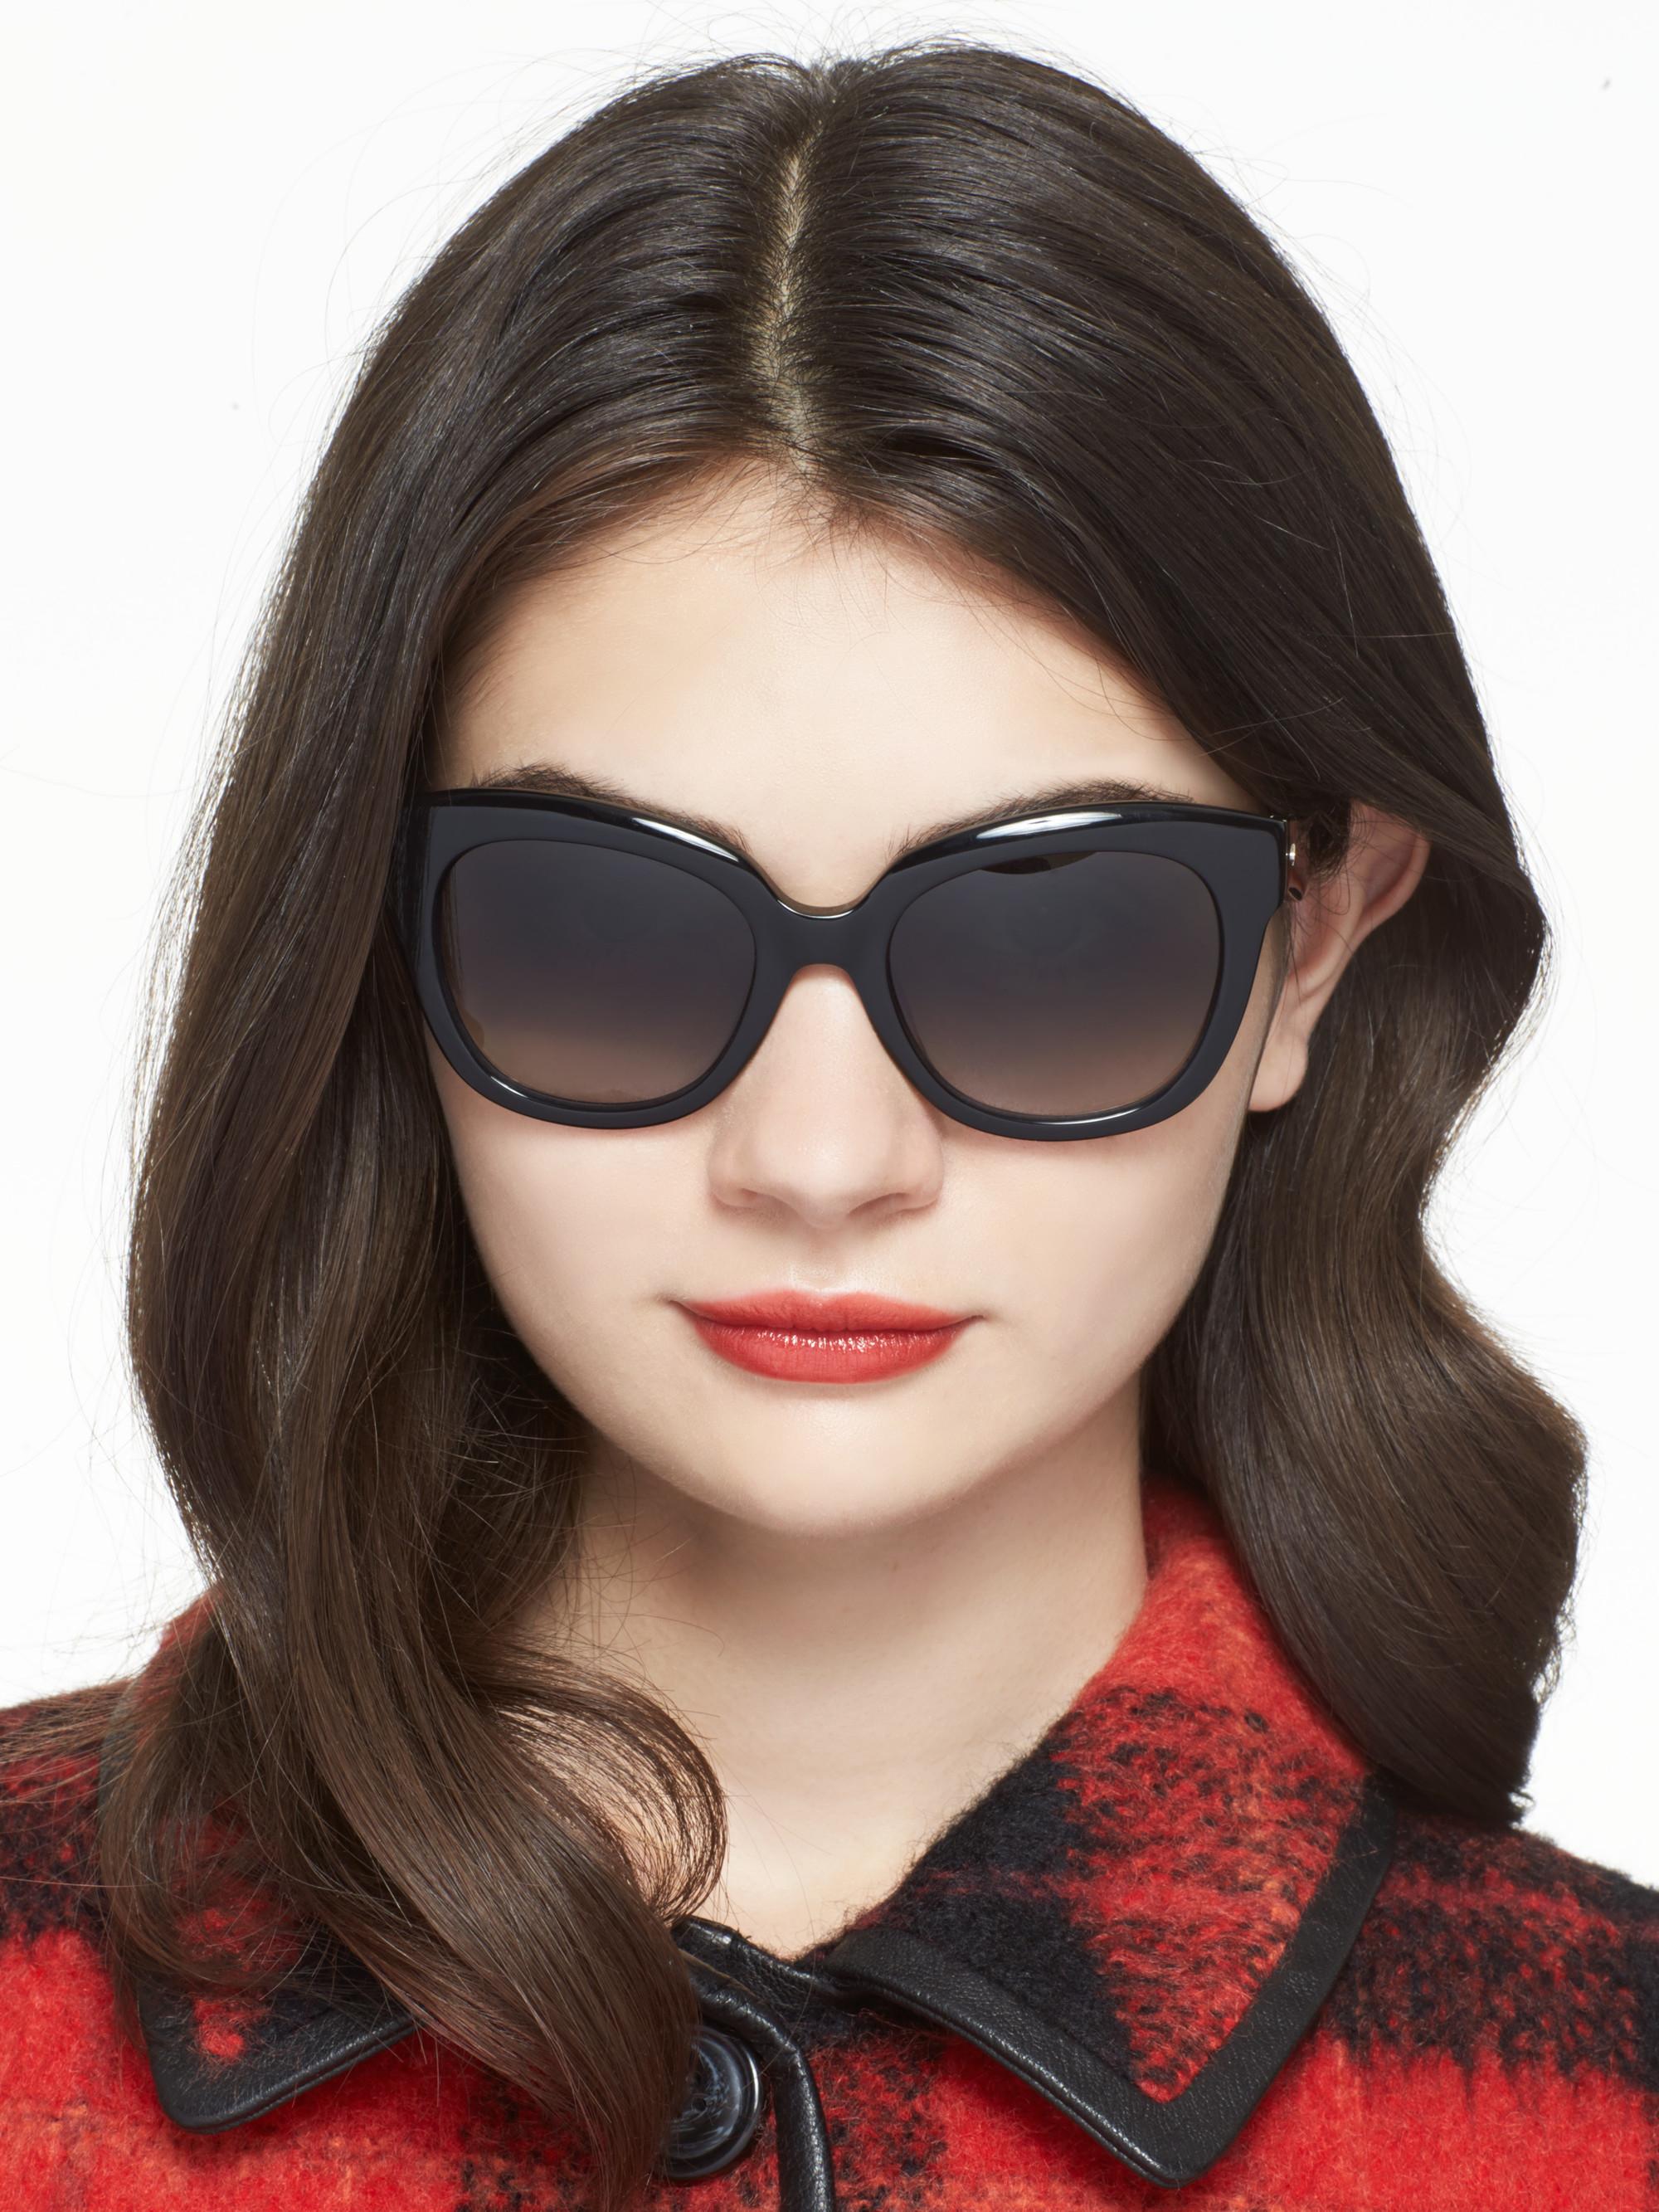 99487e7208 Lyst - Kate Spade Sharlotte Sunglasses in Black